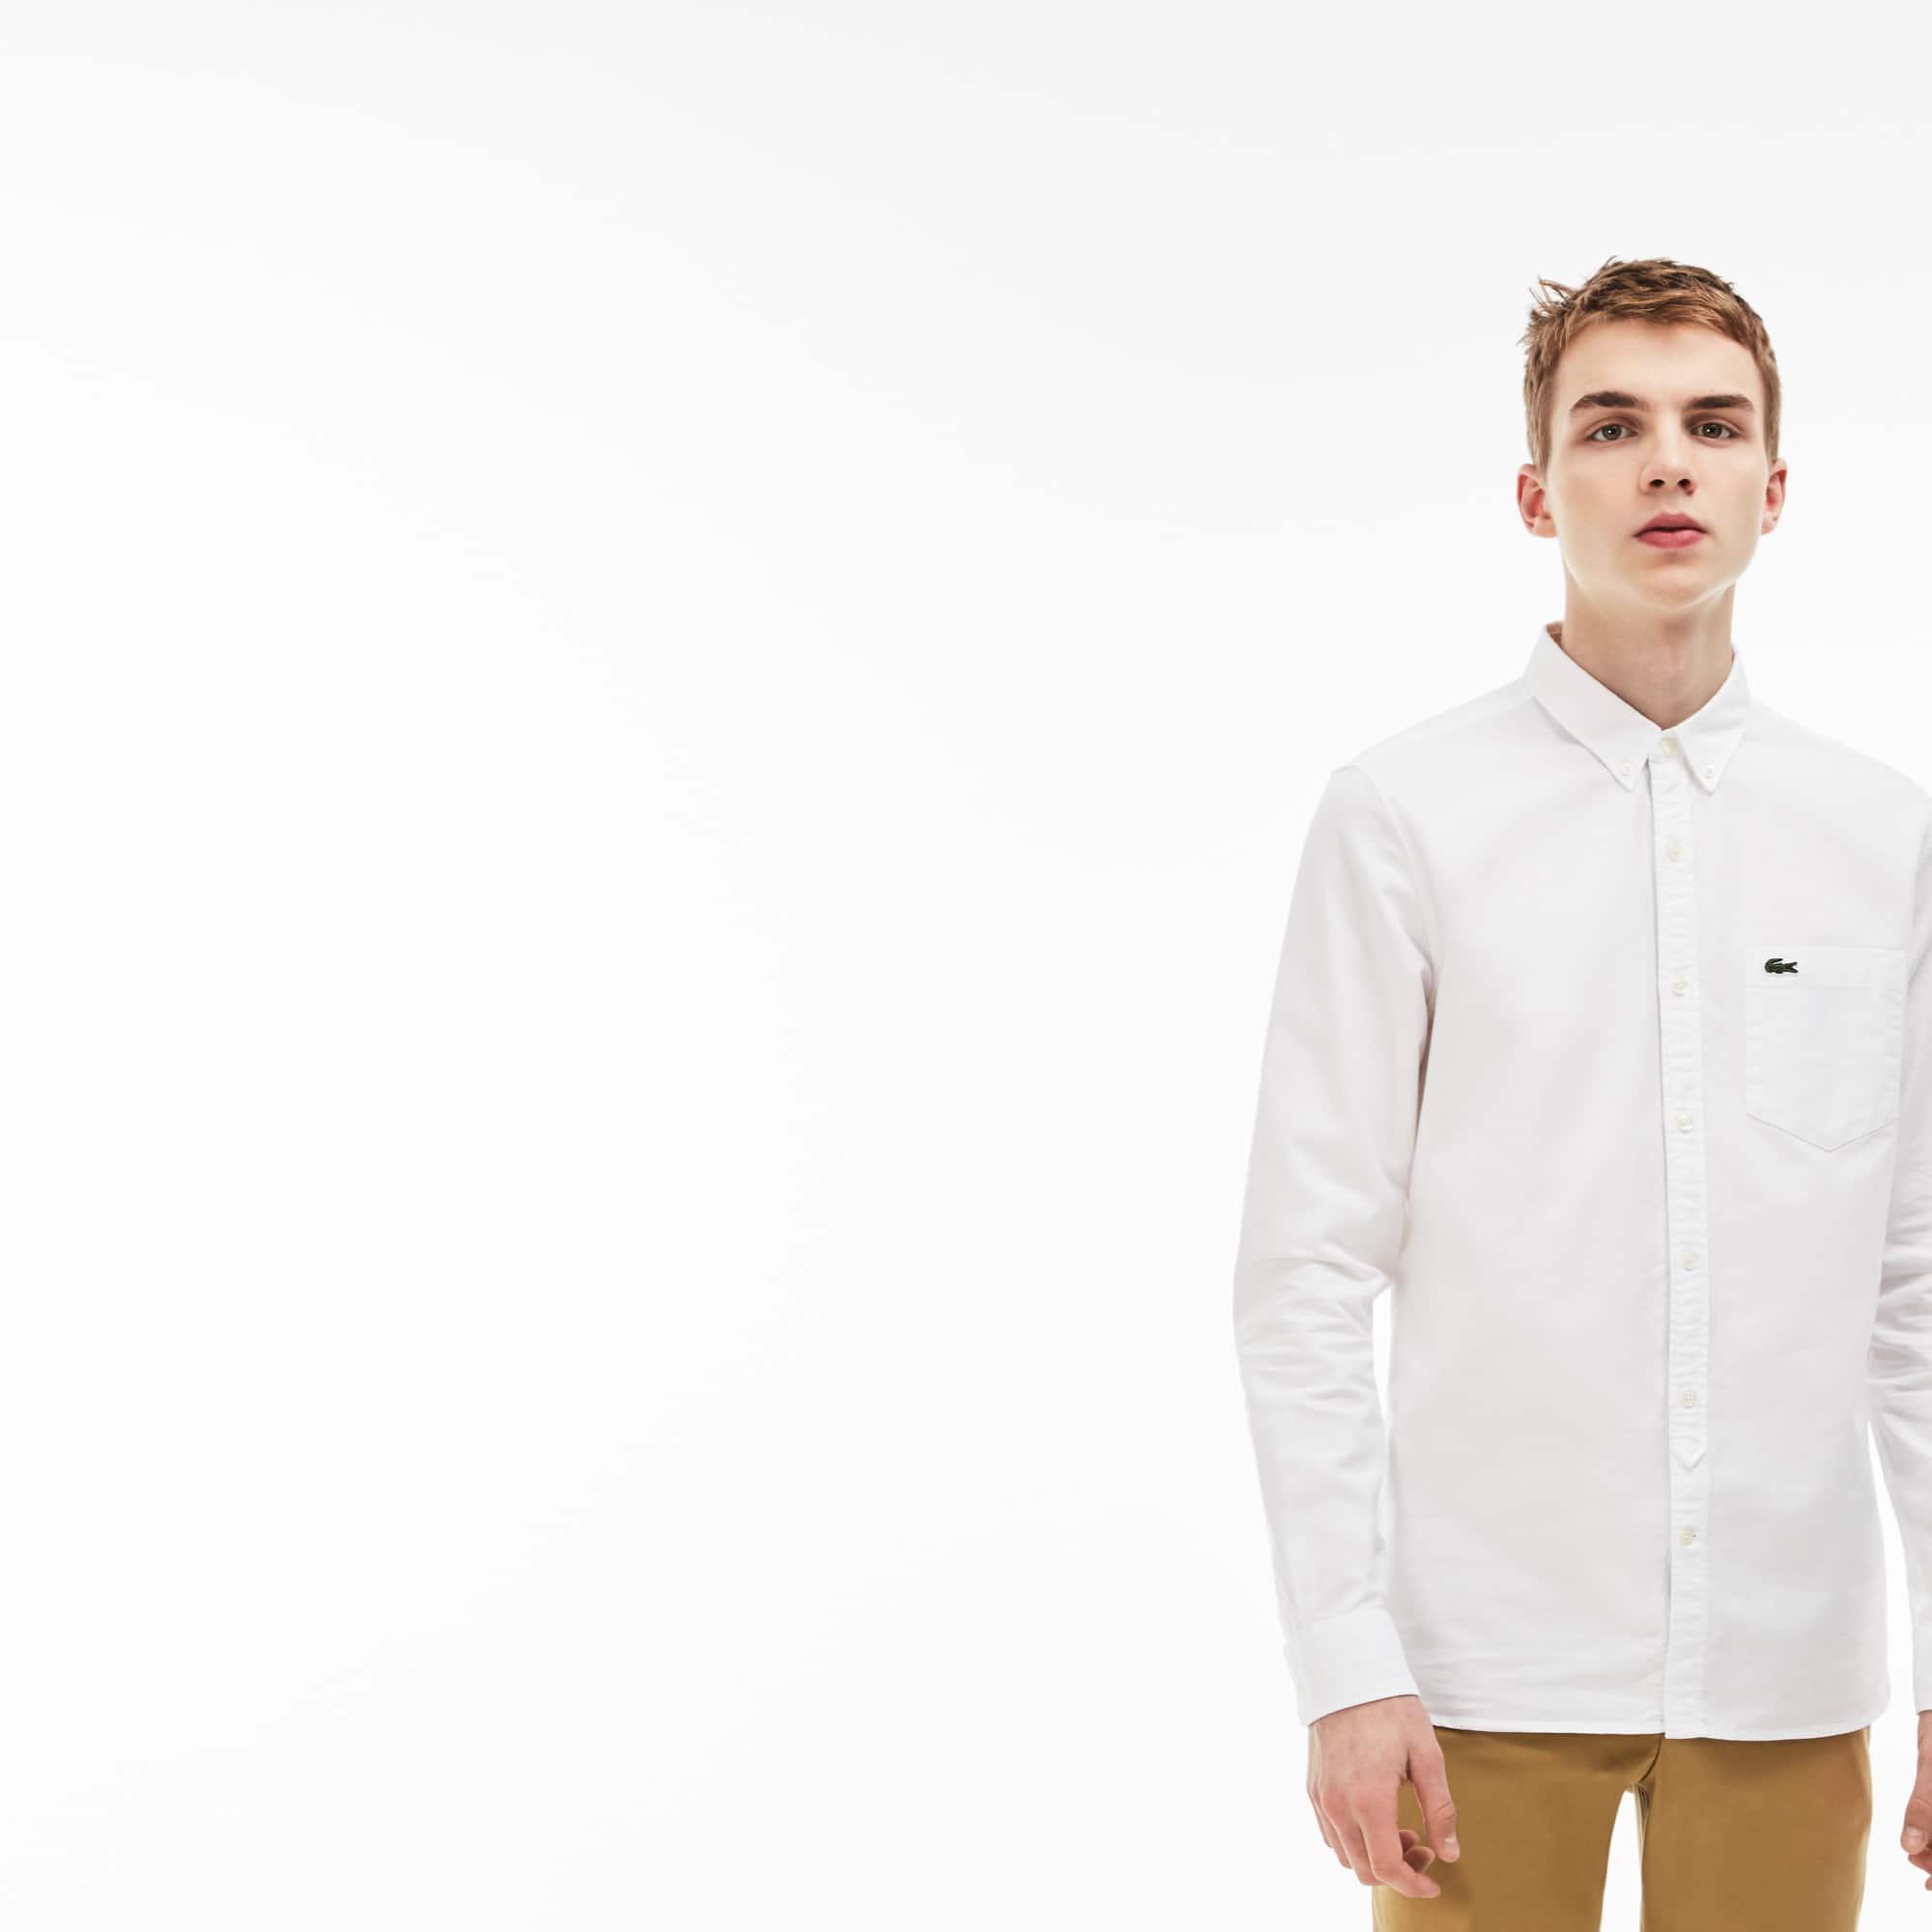 Men's Lacoste LIVE Skinny Fit Oxford Cotton Shirt